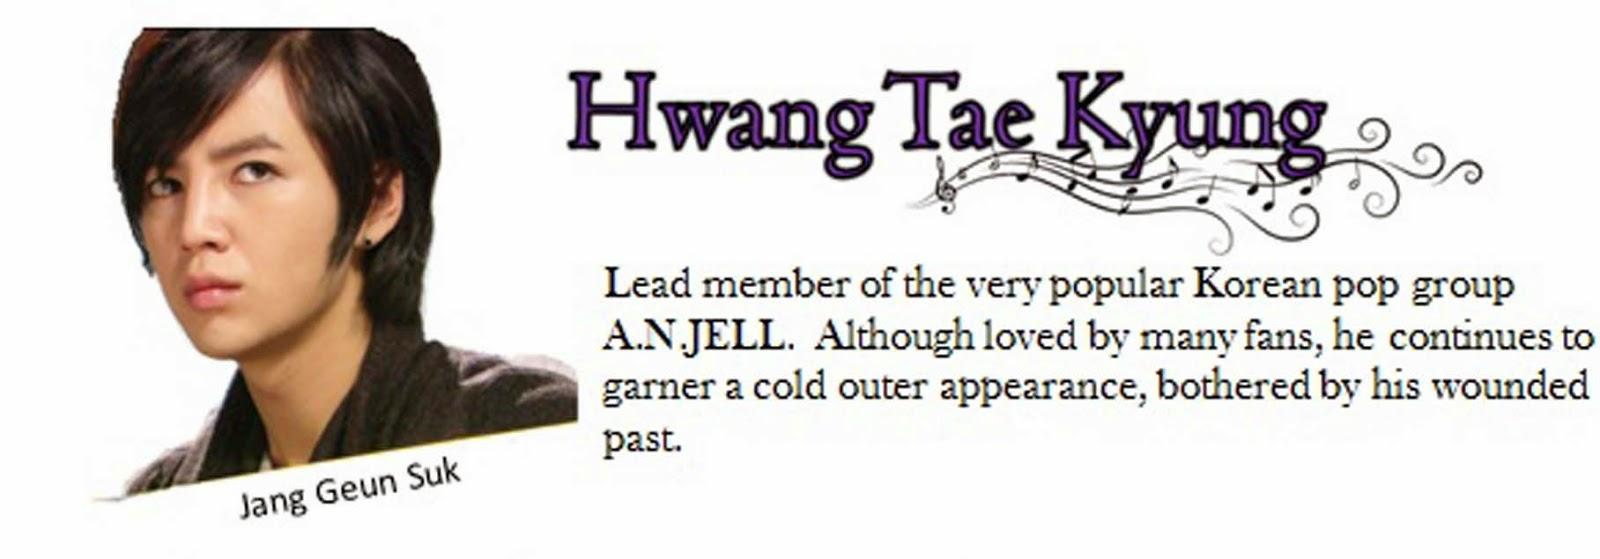 Jang geun suk sebagai Hwang Tae kyung